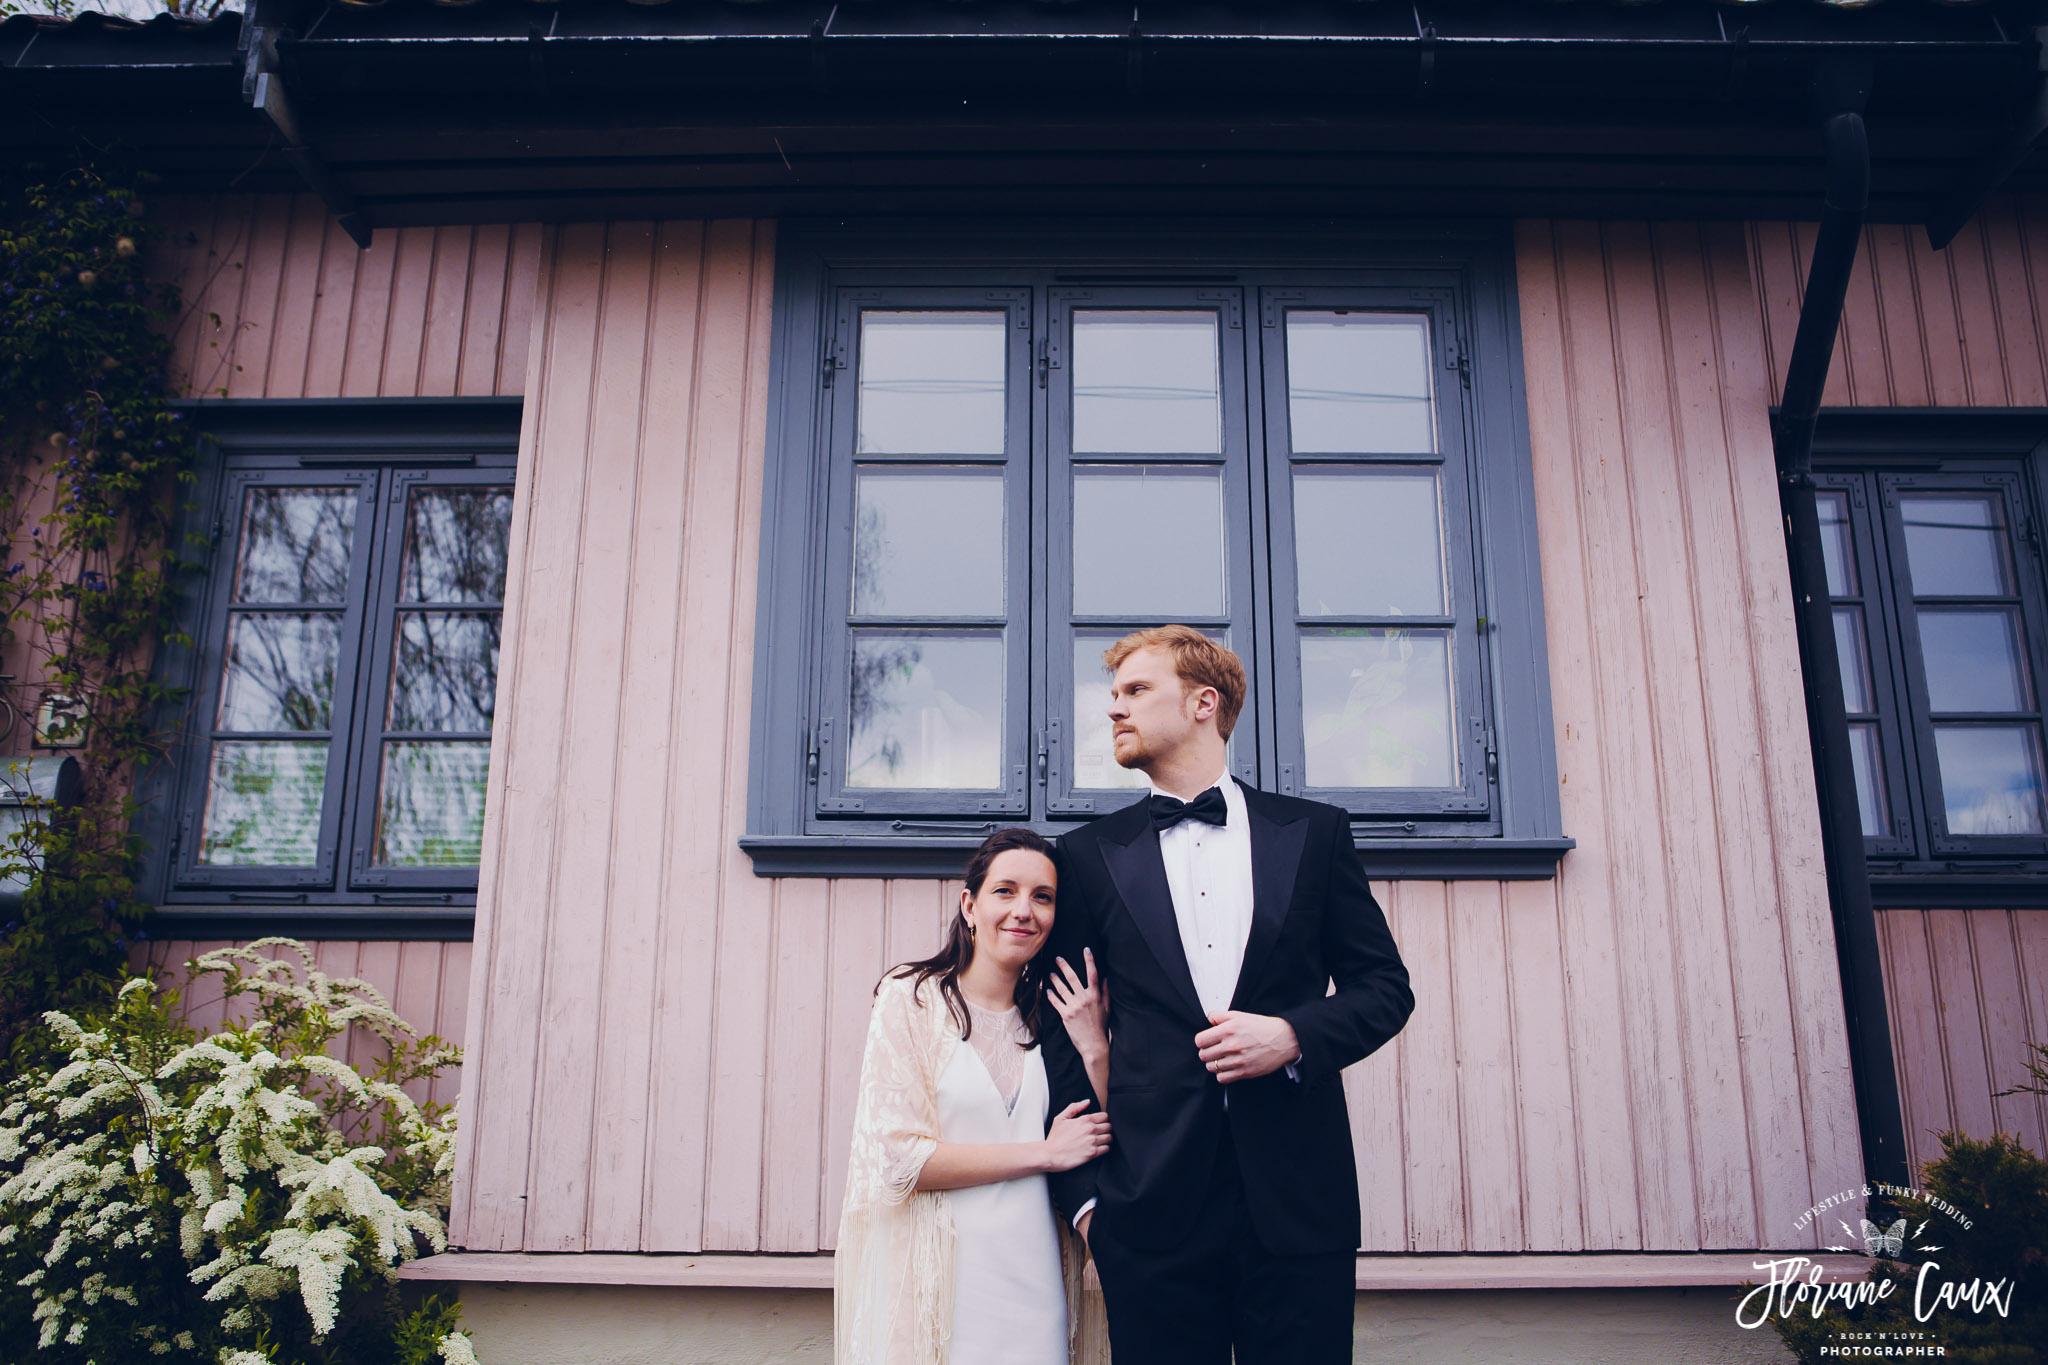 destination-wedding-photographer-oslo-norway-floriane-caux-5